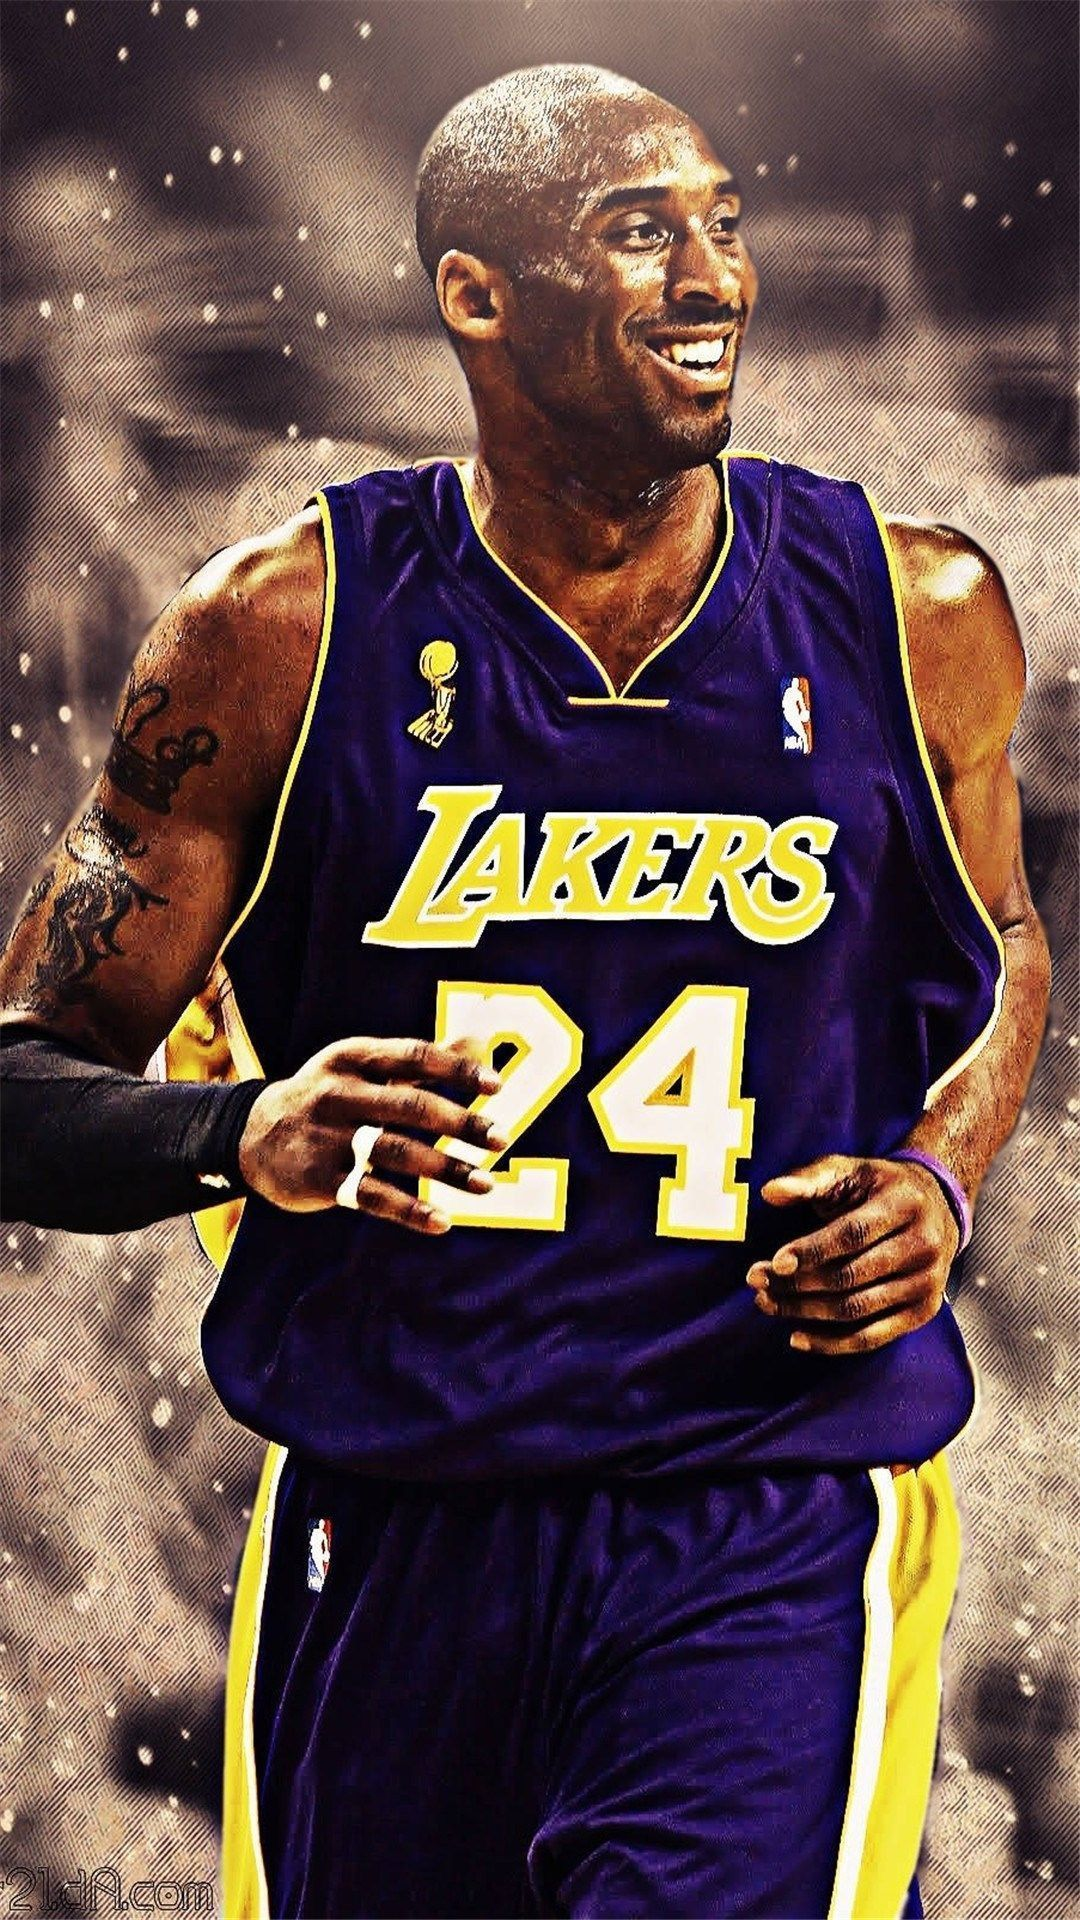 Kobe Bryant Desktop 1080p Wallpaper Hdwallpaper Desktop Kobe Bryant Kobe Bryant Wallpapers Kobe Bryant Wallpaper